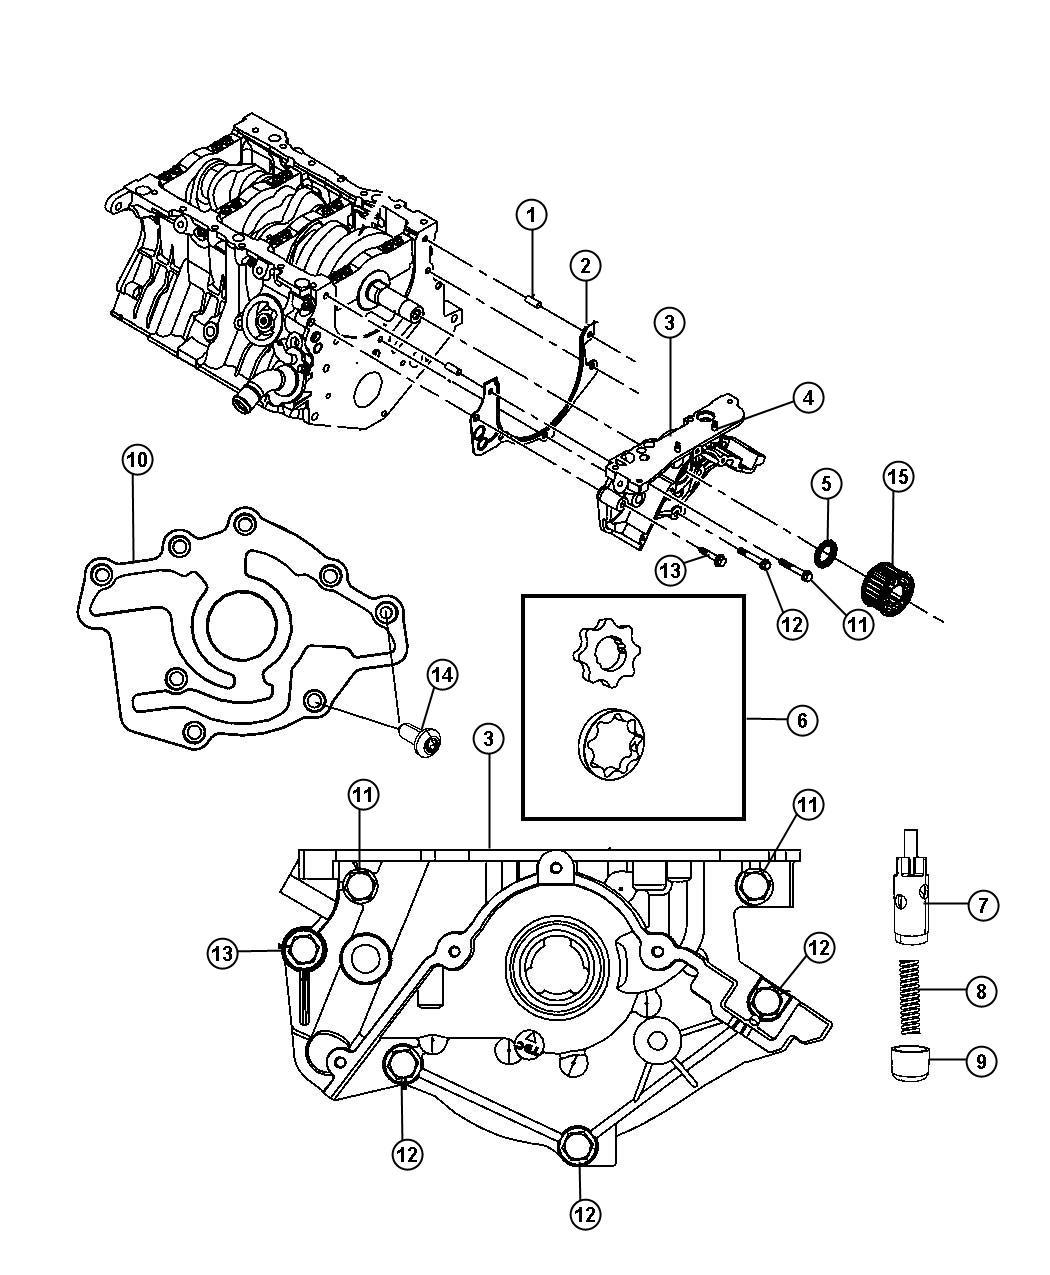 Jeep Wrangler Cap Oil Pressure Relief Valve 27 Oil